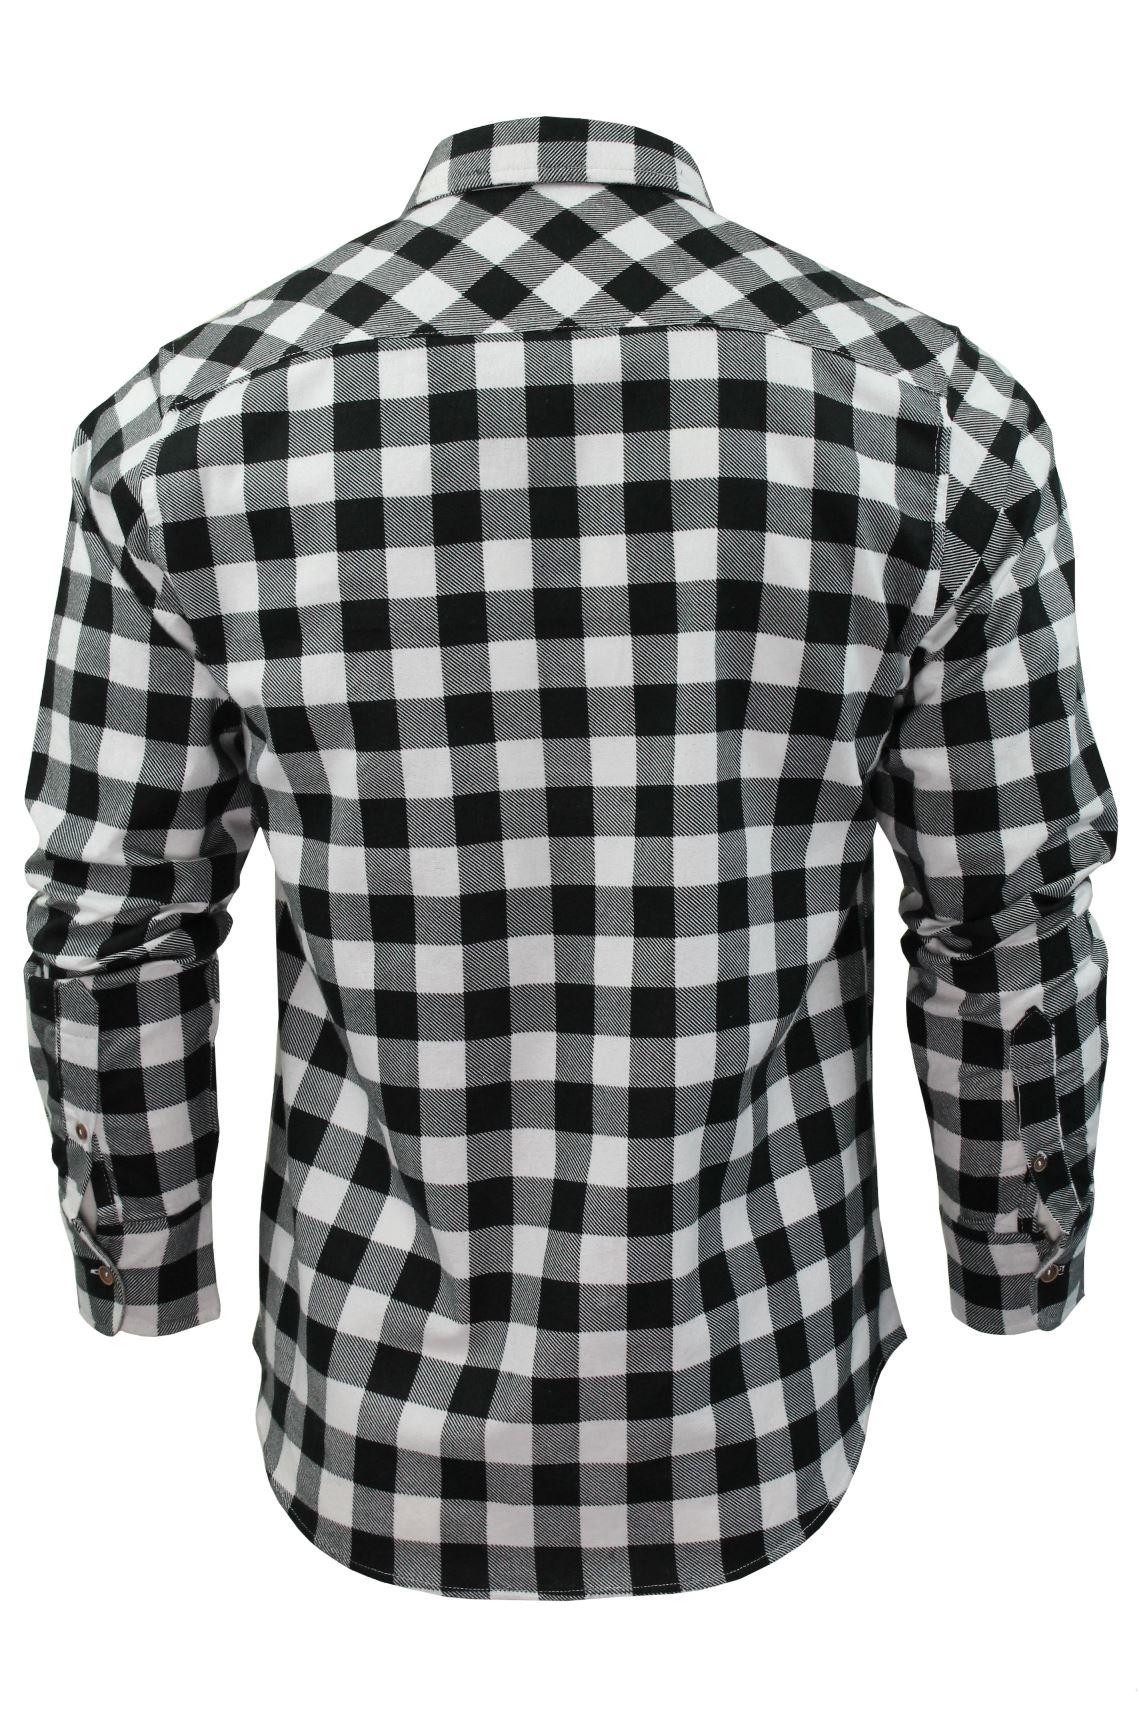 Brave-Soul-Brushed-Flannel-Check-Cotton-Jack-Shirt-Long-Sleeved thumbnail 12